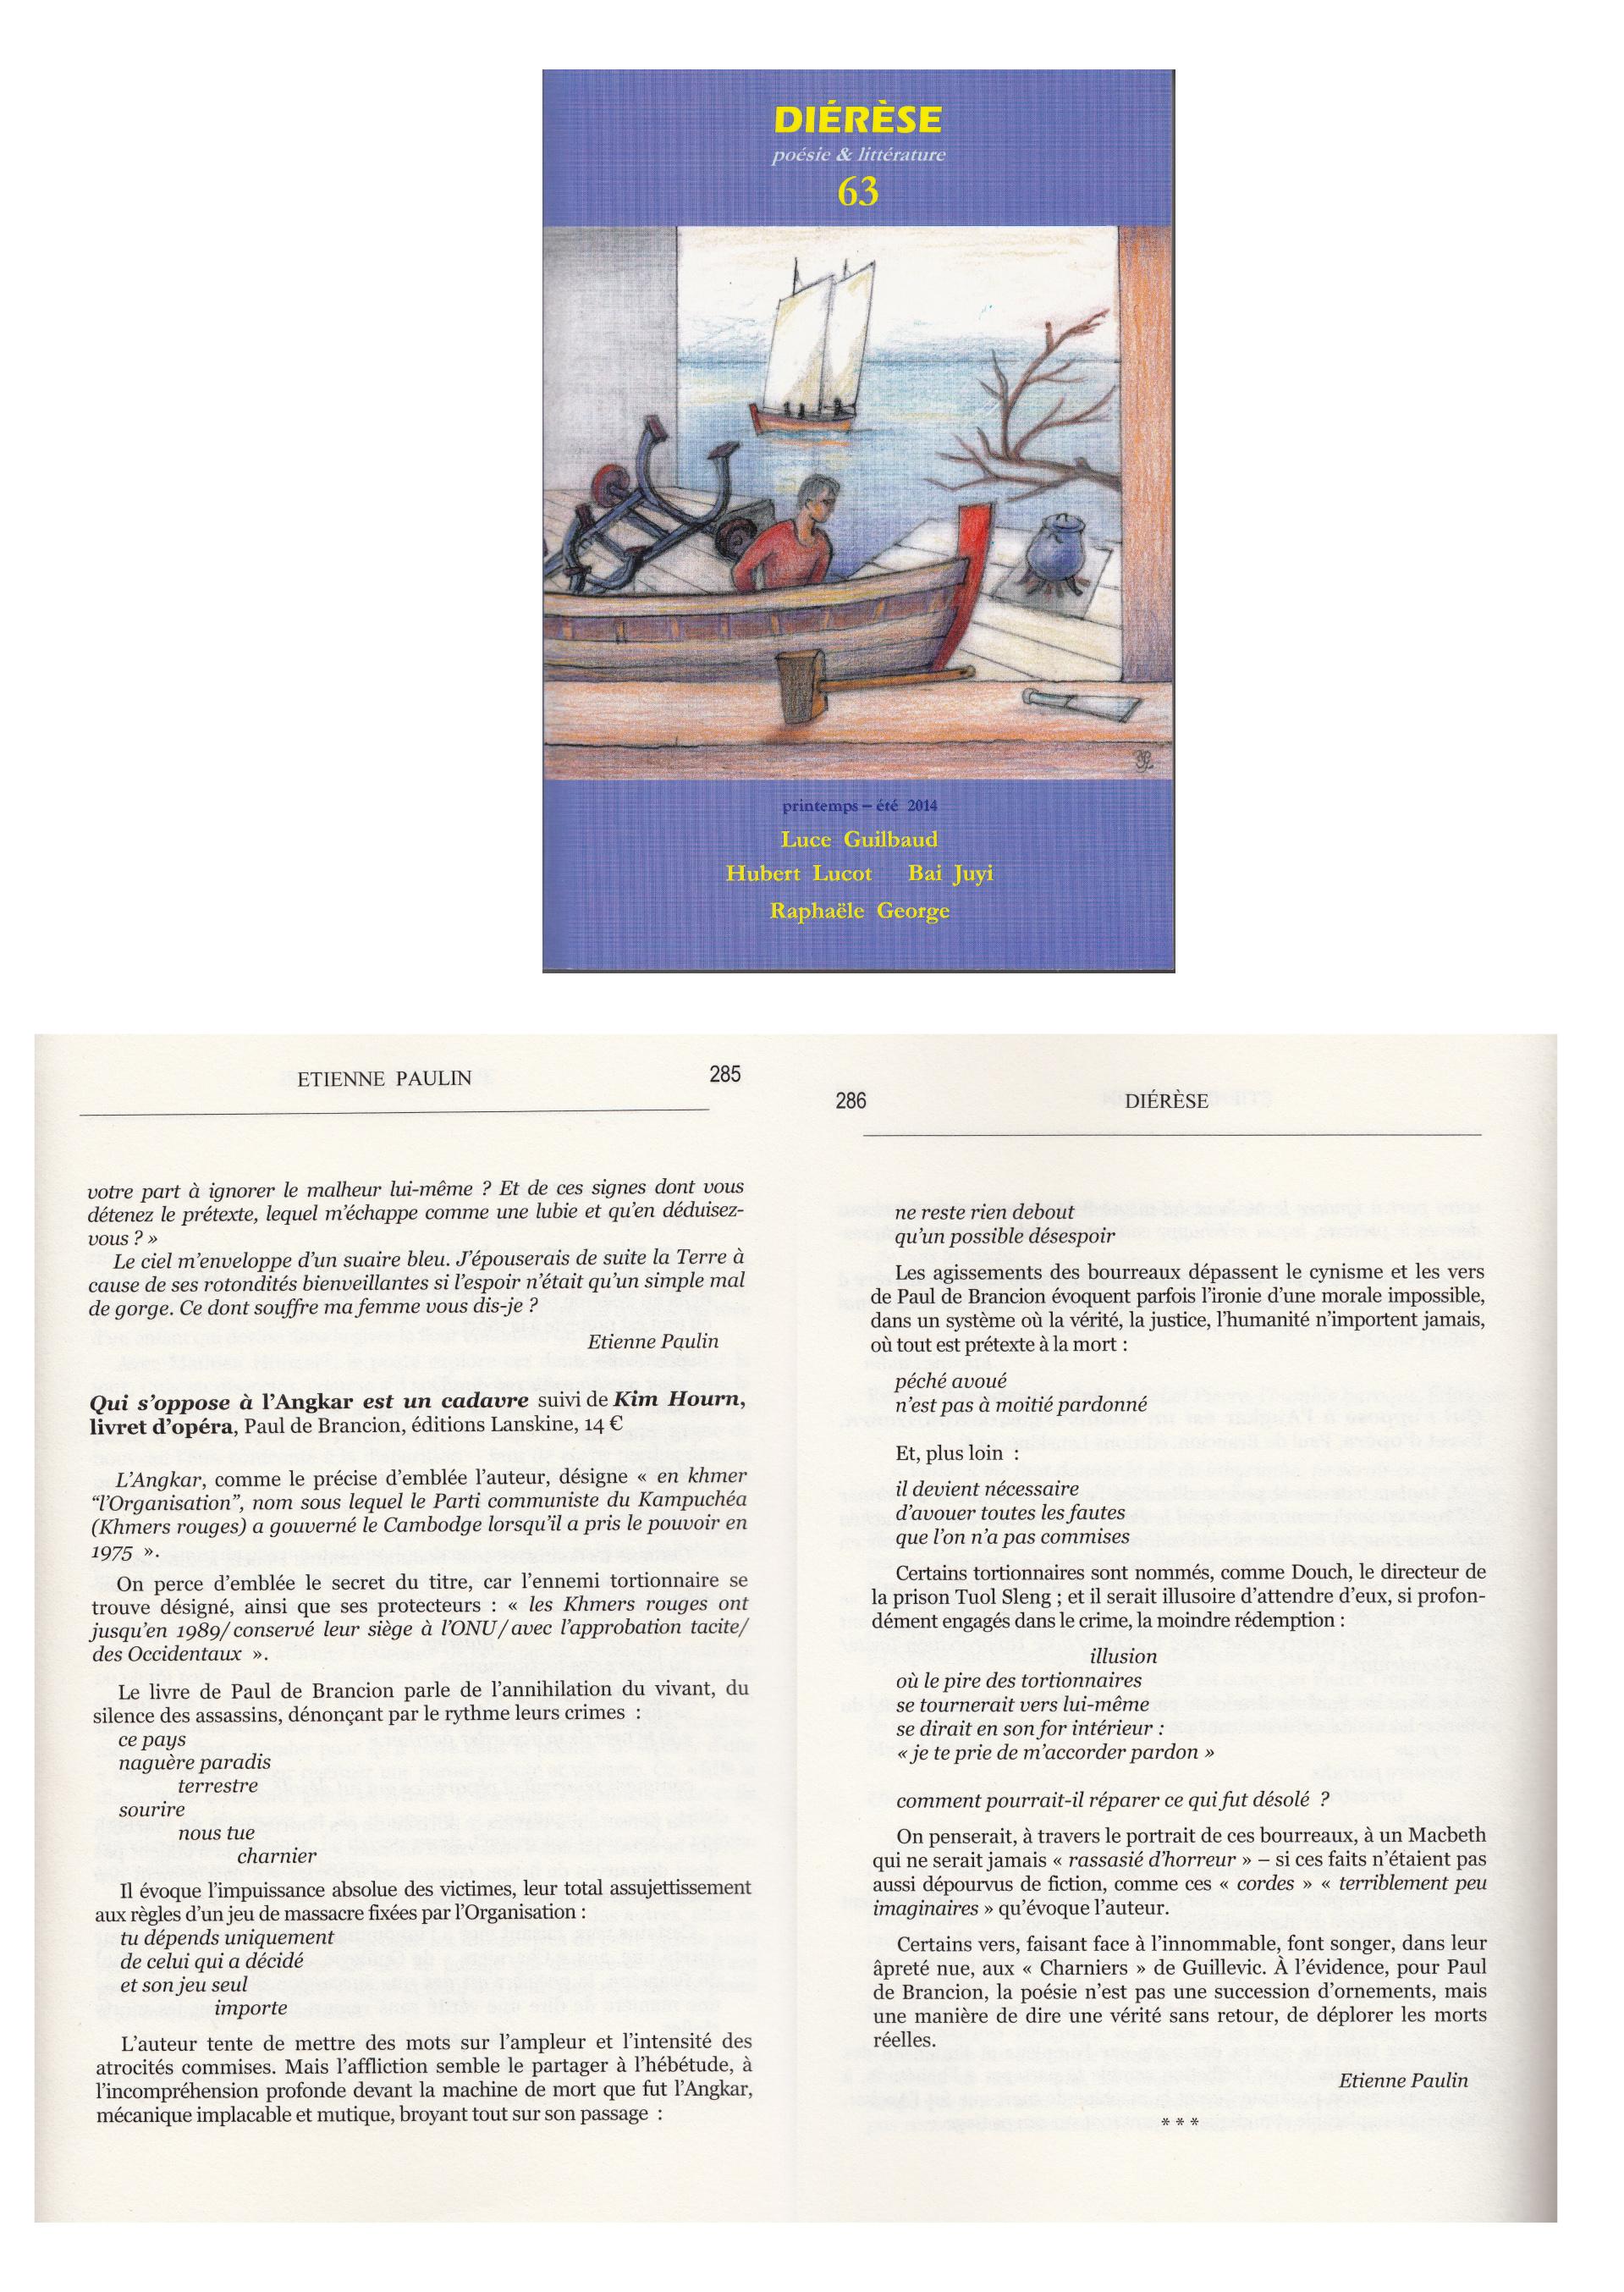 Microsoft Word - Angkar Dierese.doc